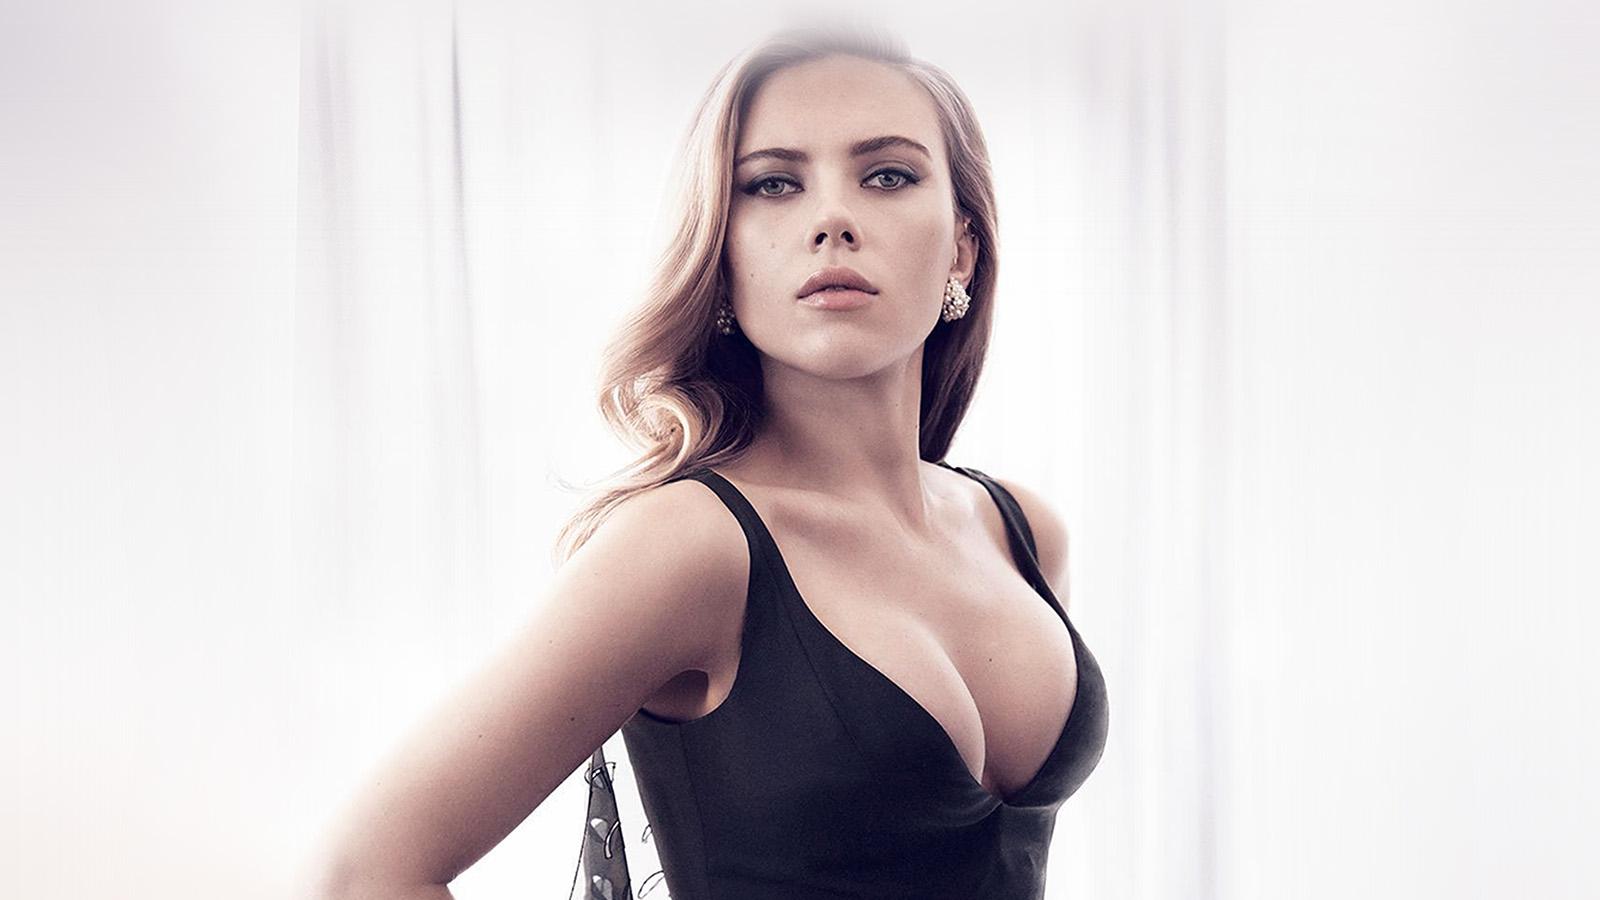 Fall Disney Iphone Wallpaper Ho52 Scarlett Johansson Girl Film Sexy Hero Wallpaper